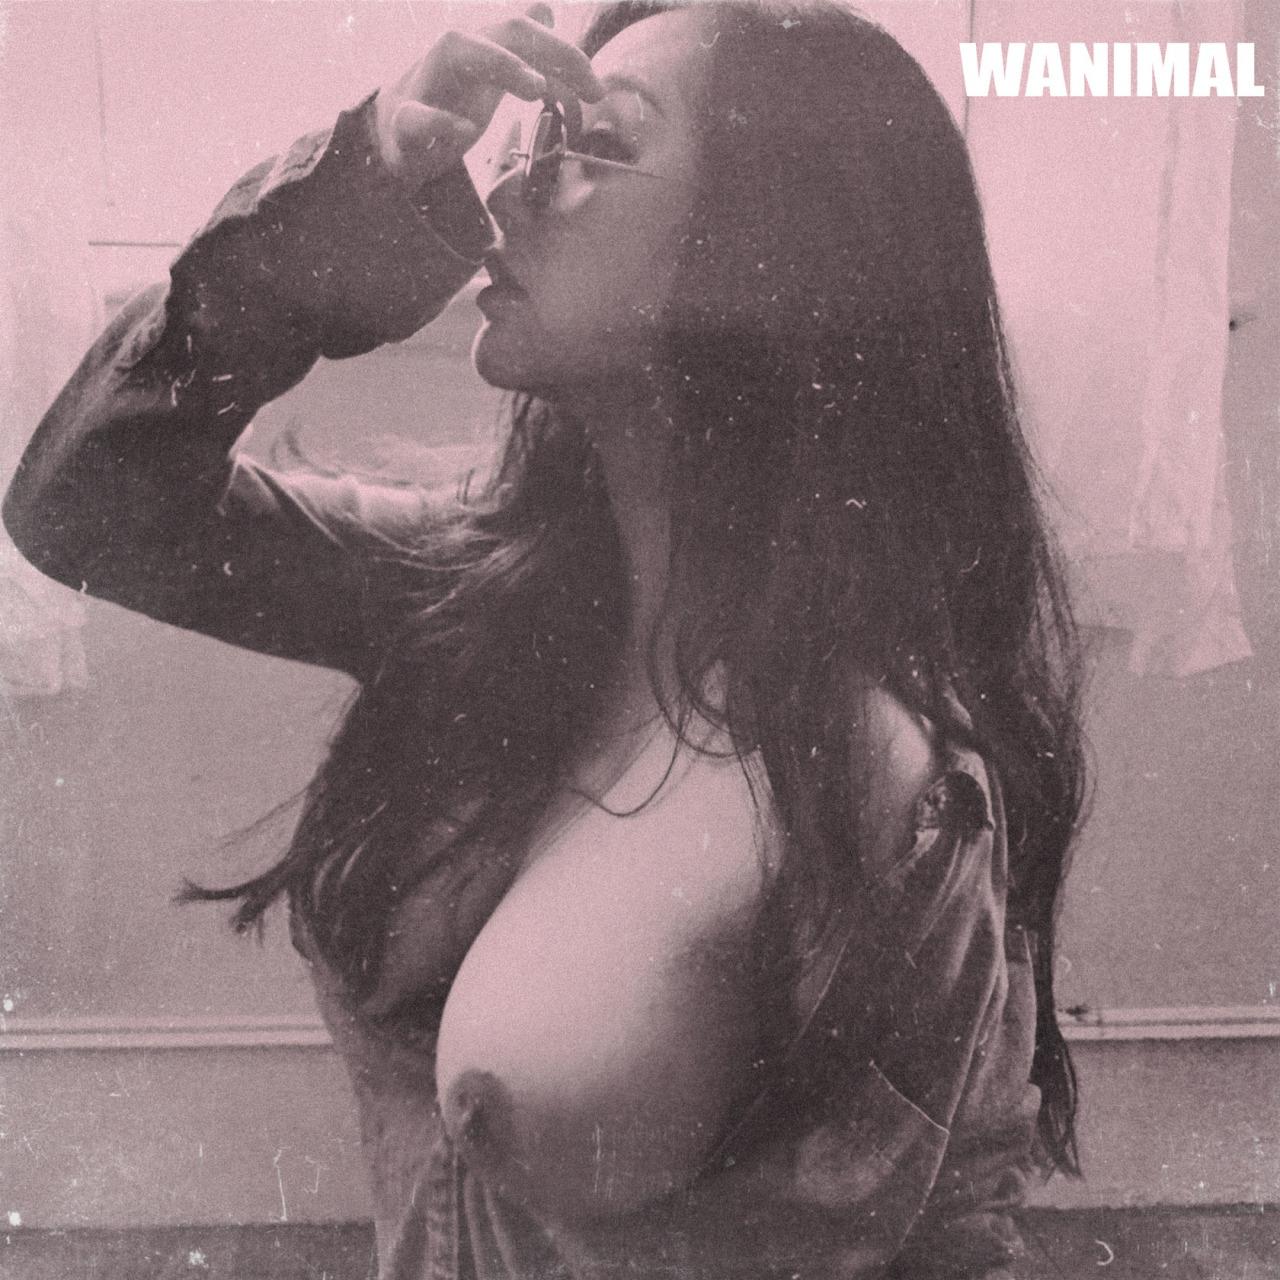 wanimal-retro.jpg